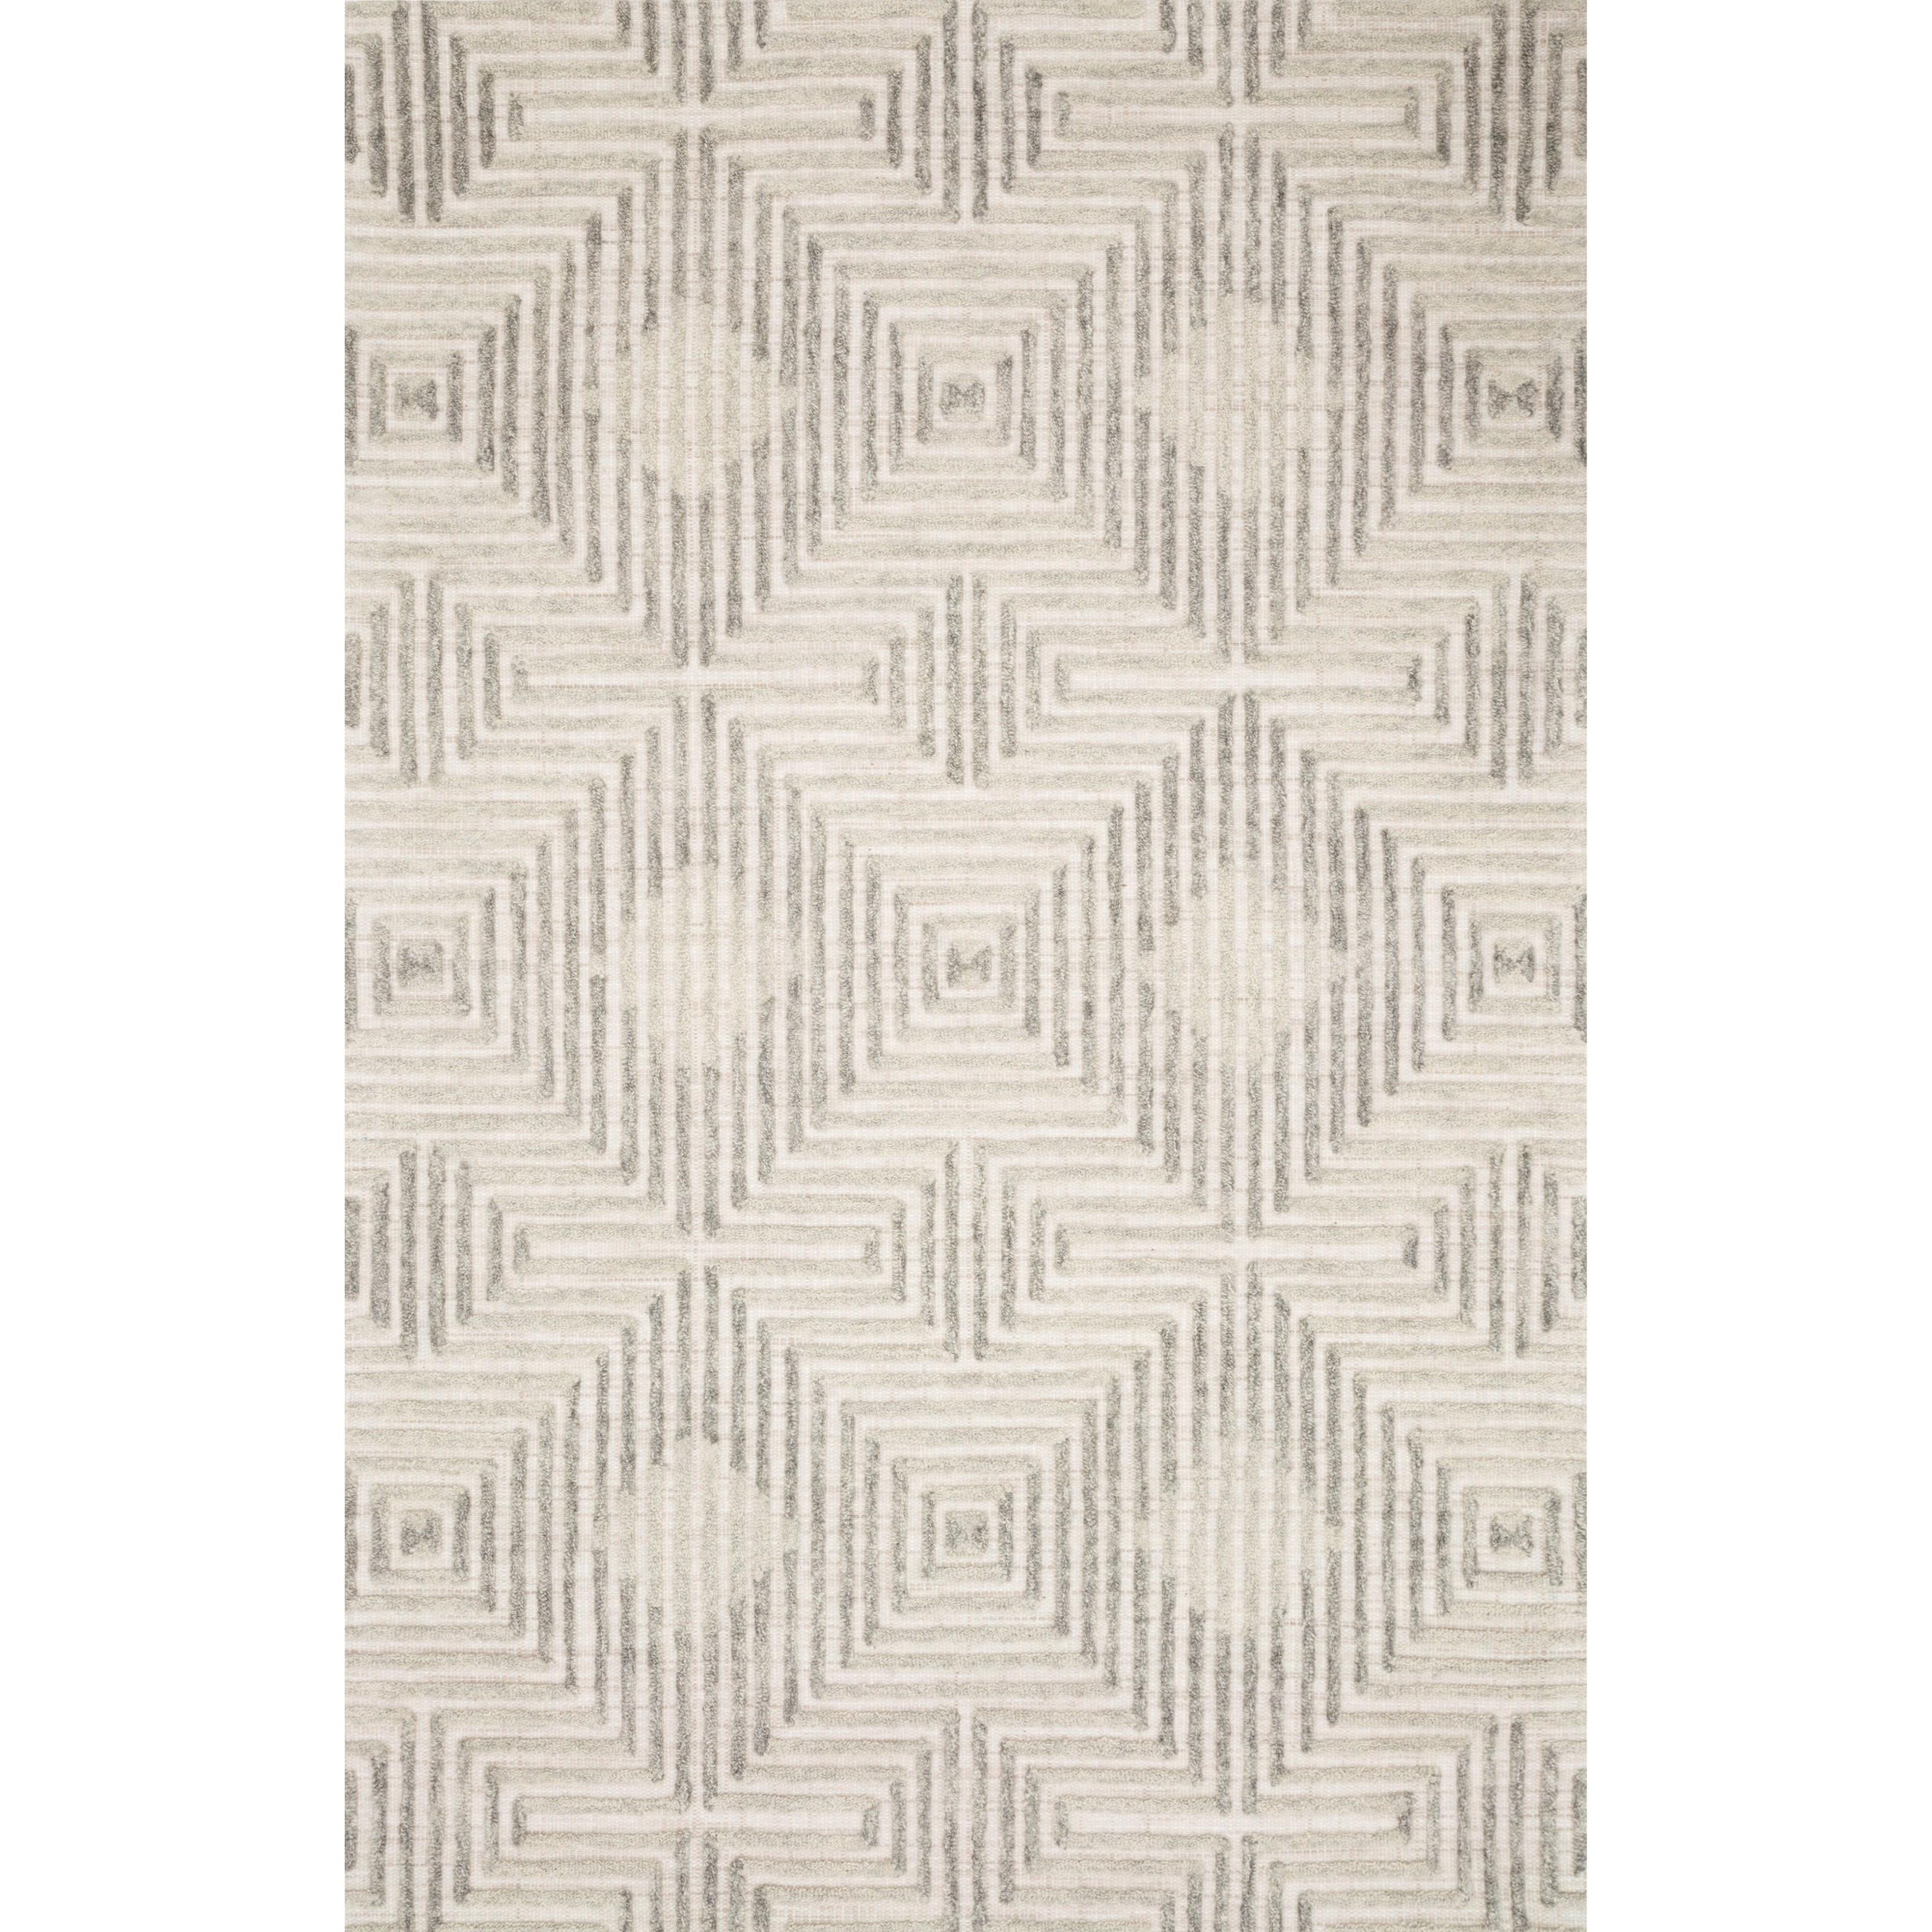 "Ehren 5'0"" x 7'6"" Grey / Silver Rug by Loloi Rugs at Virginia Furniture Market"